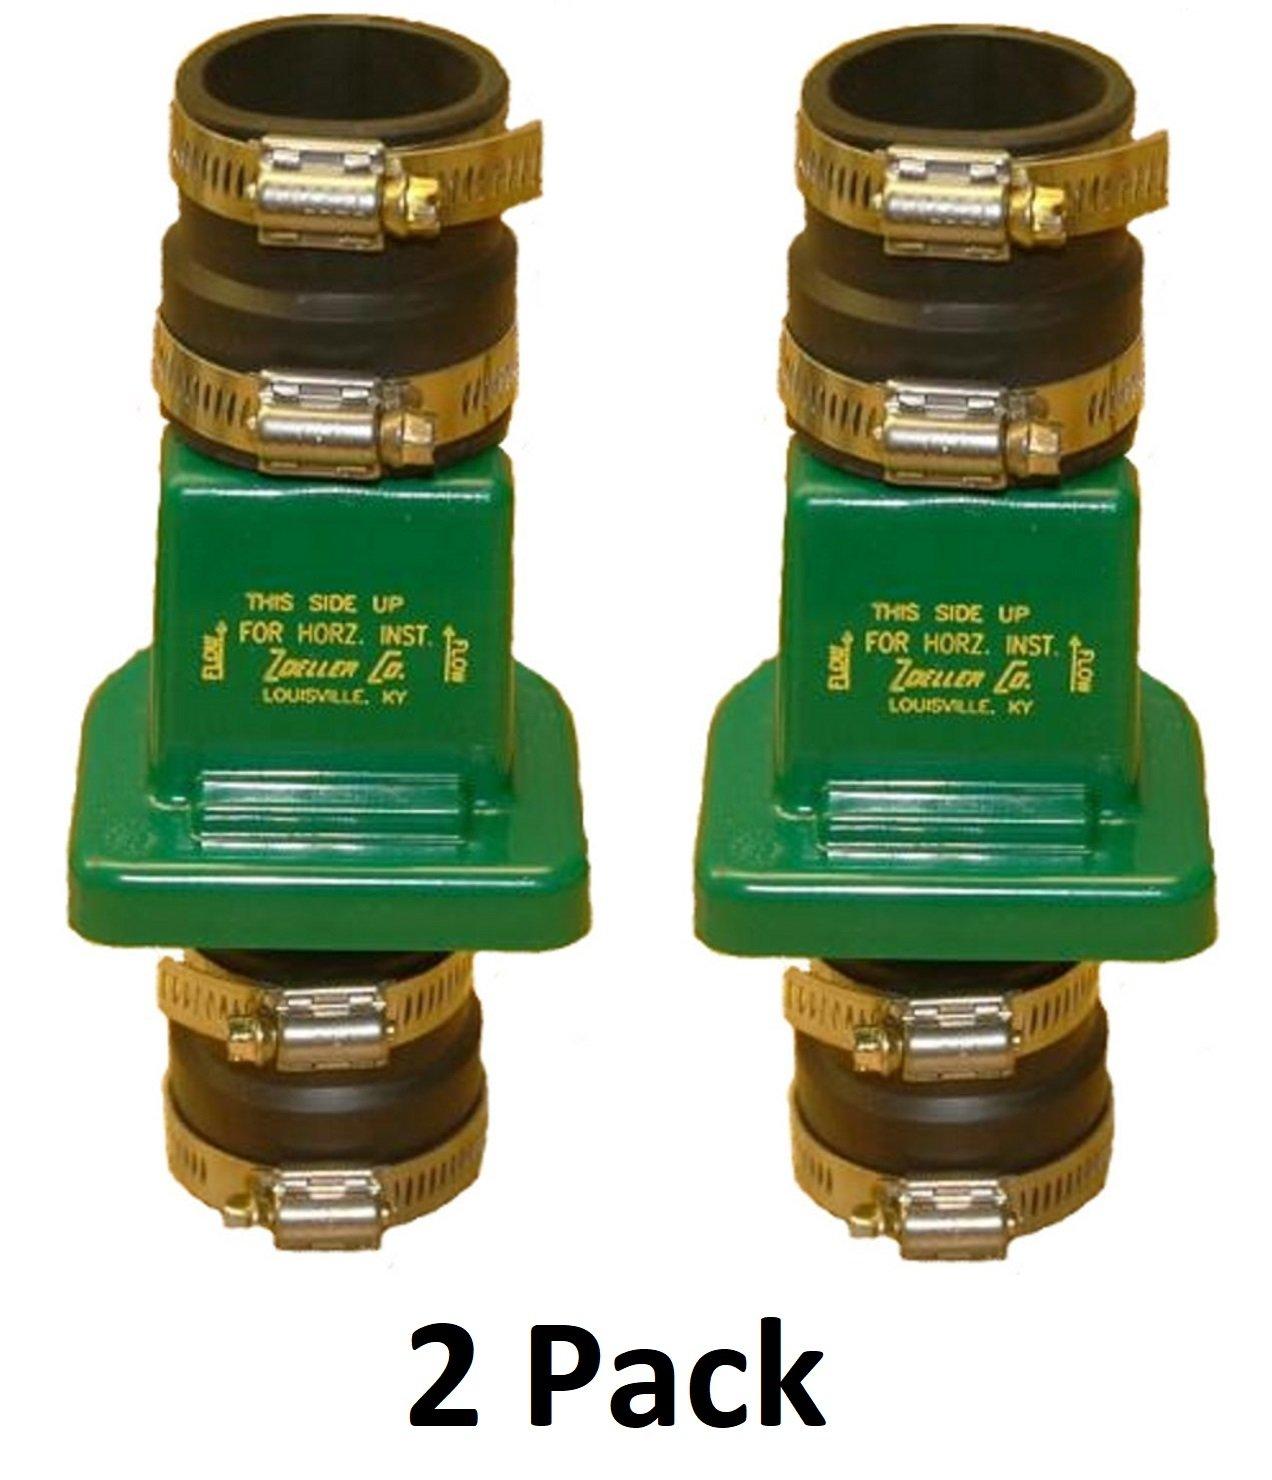 2 Pack Zoeller 30-0181 PVC Plastic Check Valve 1-1//2 Inch